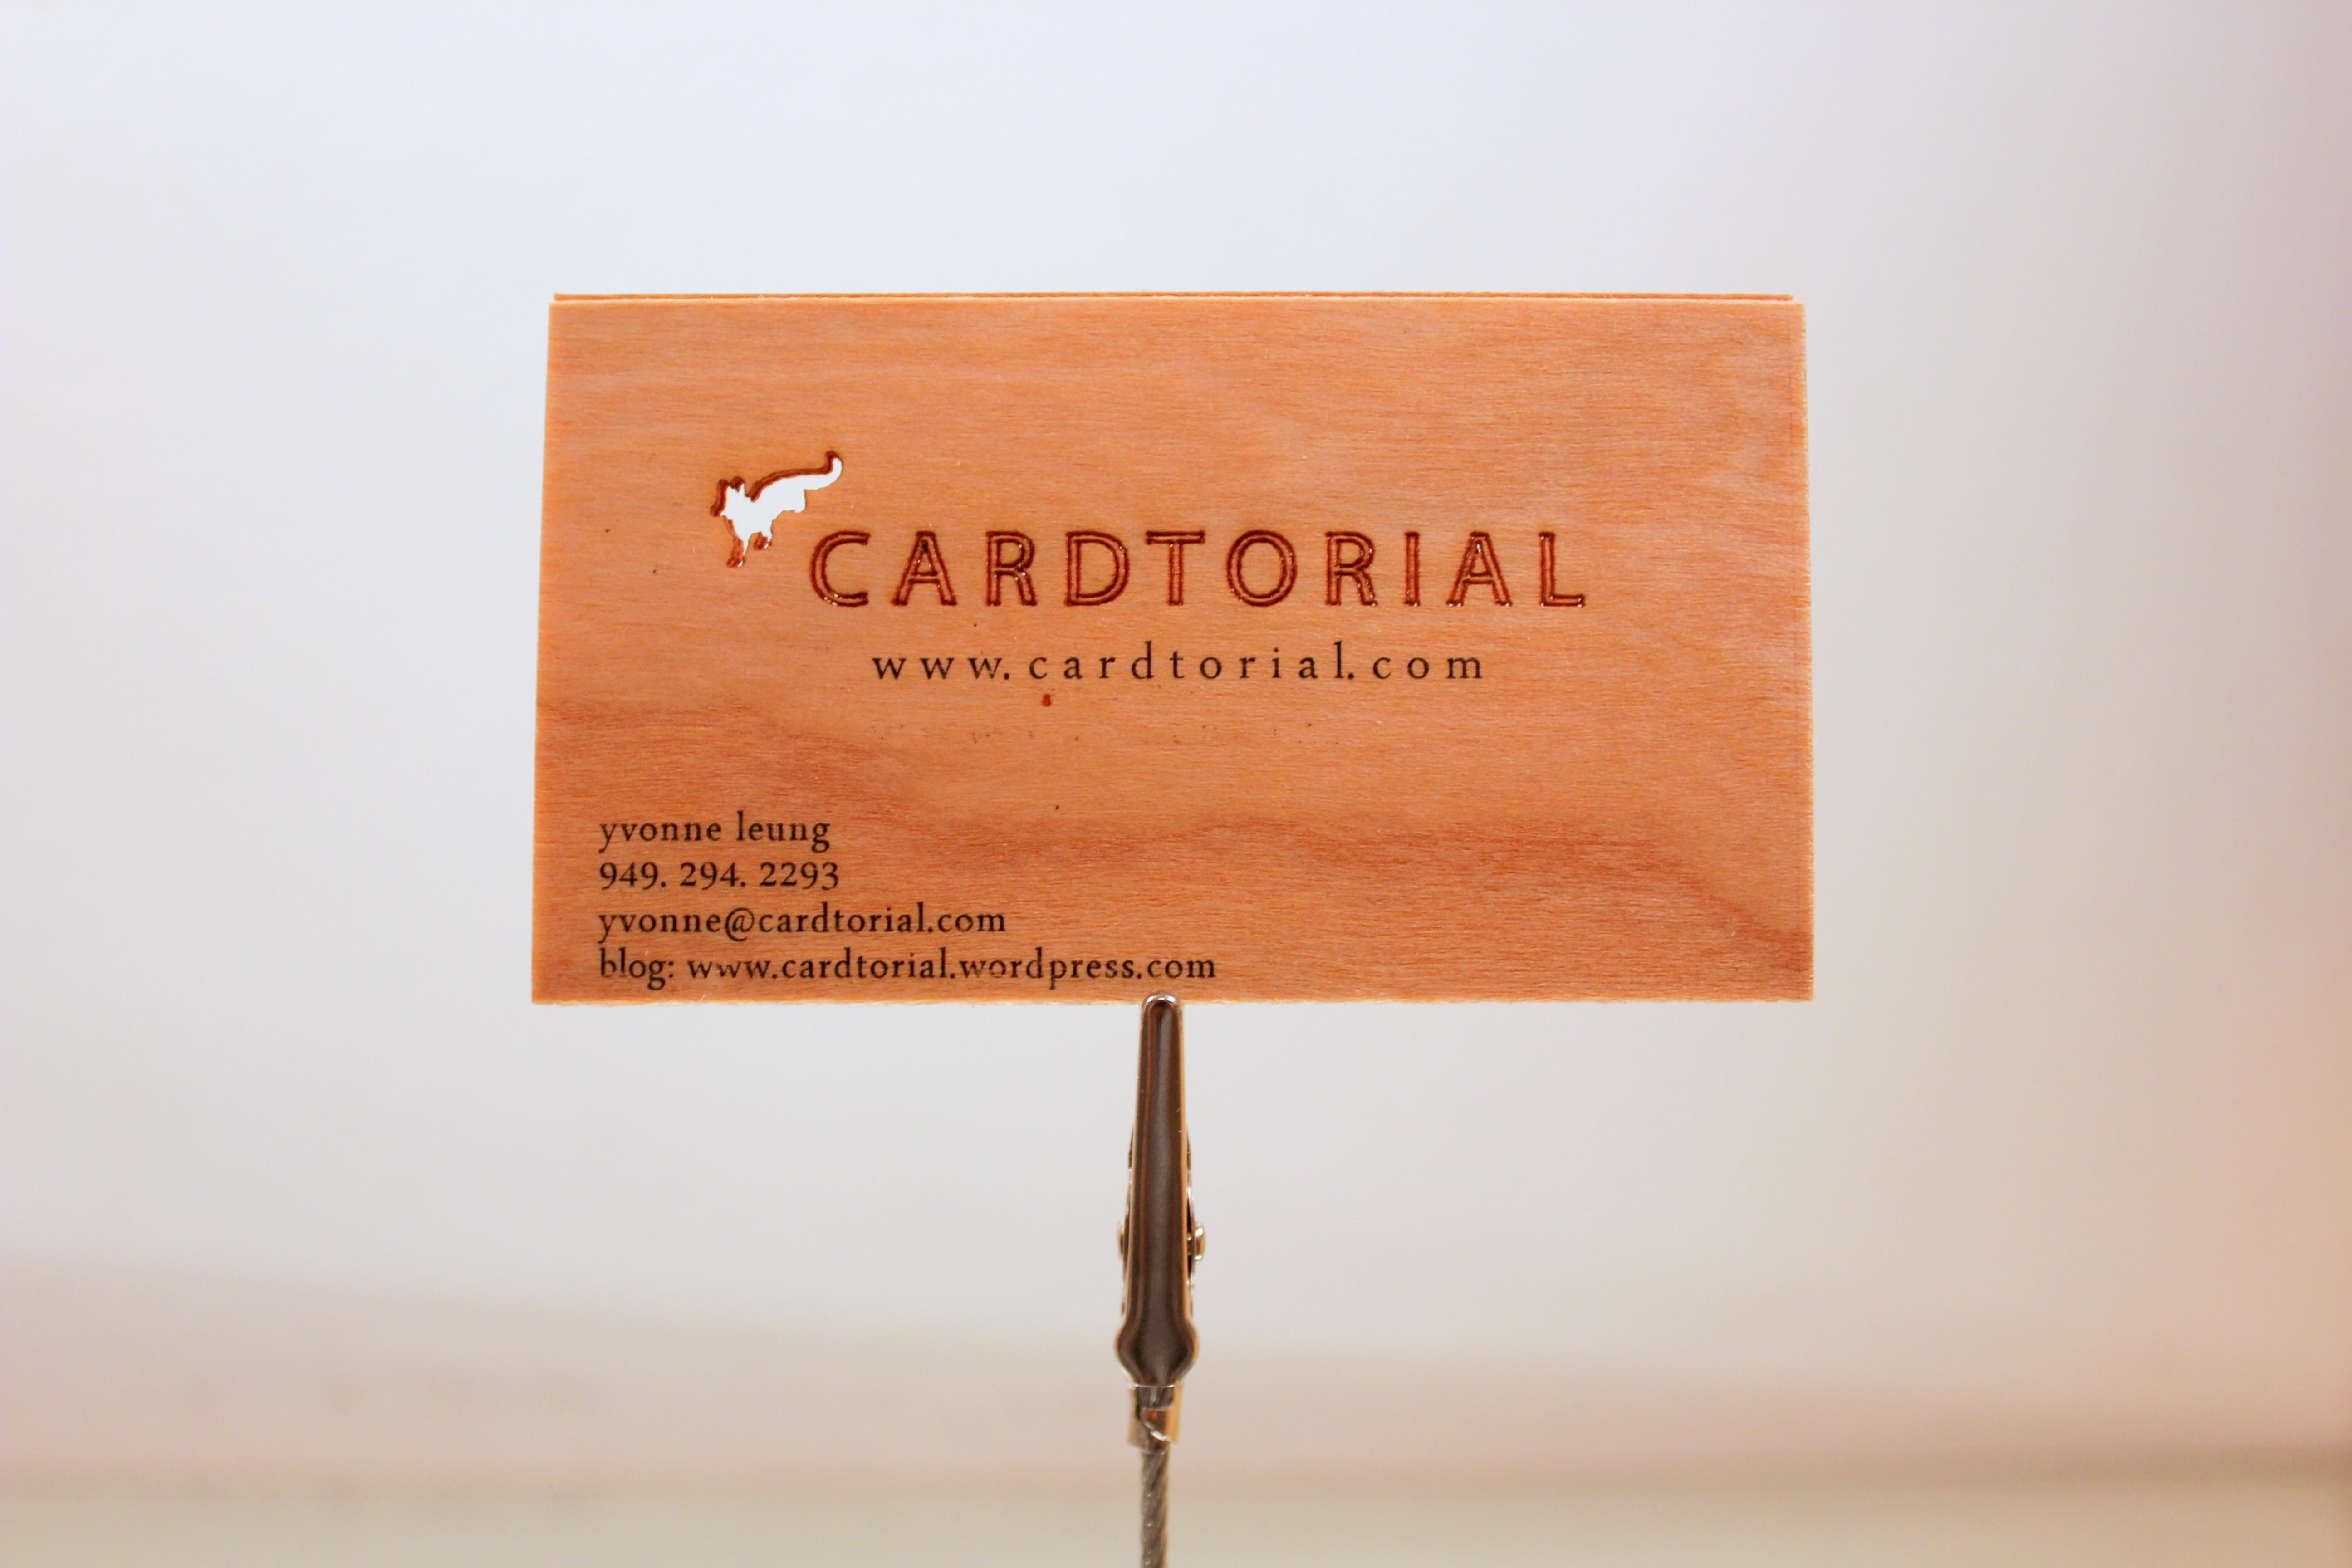 Cardtorial Wood Veneer, Laser Cut Business Cards! | cardtorial